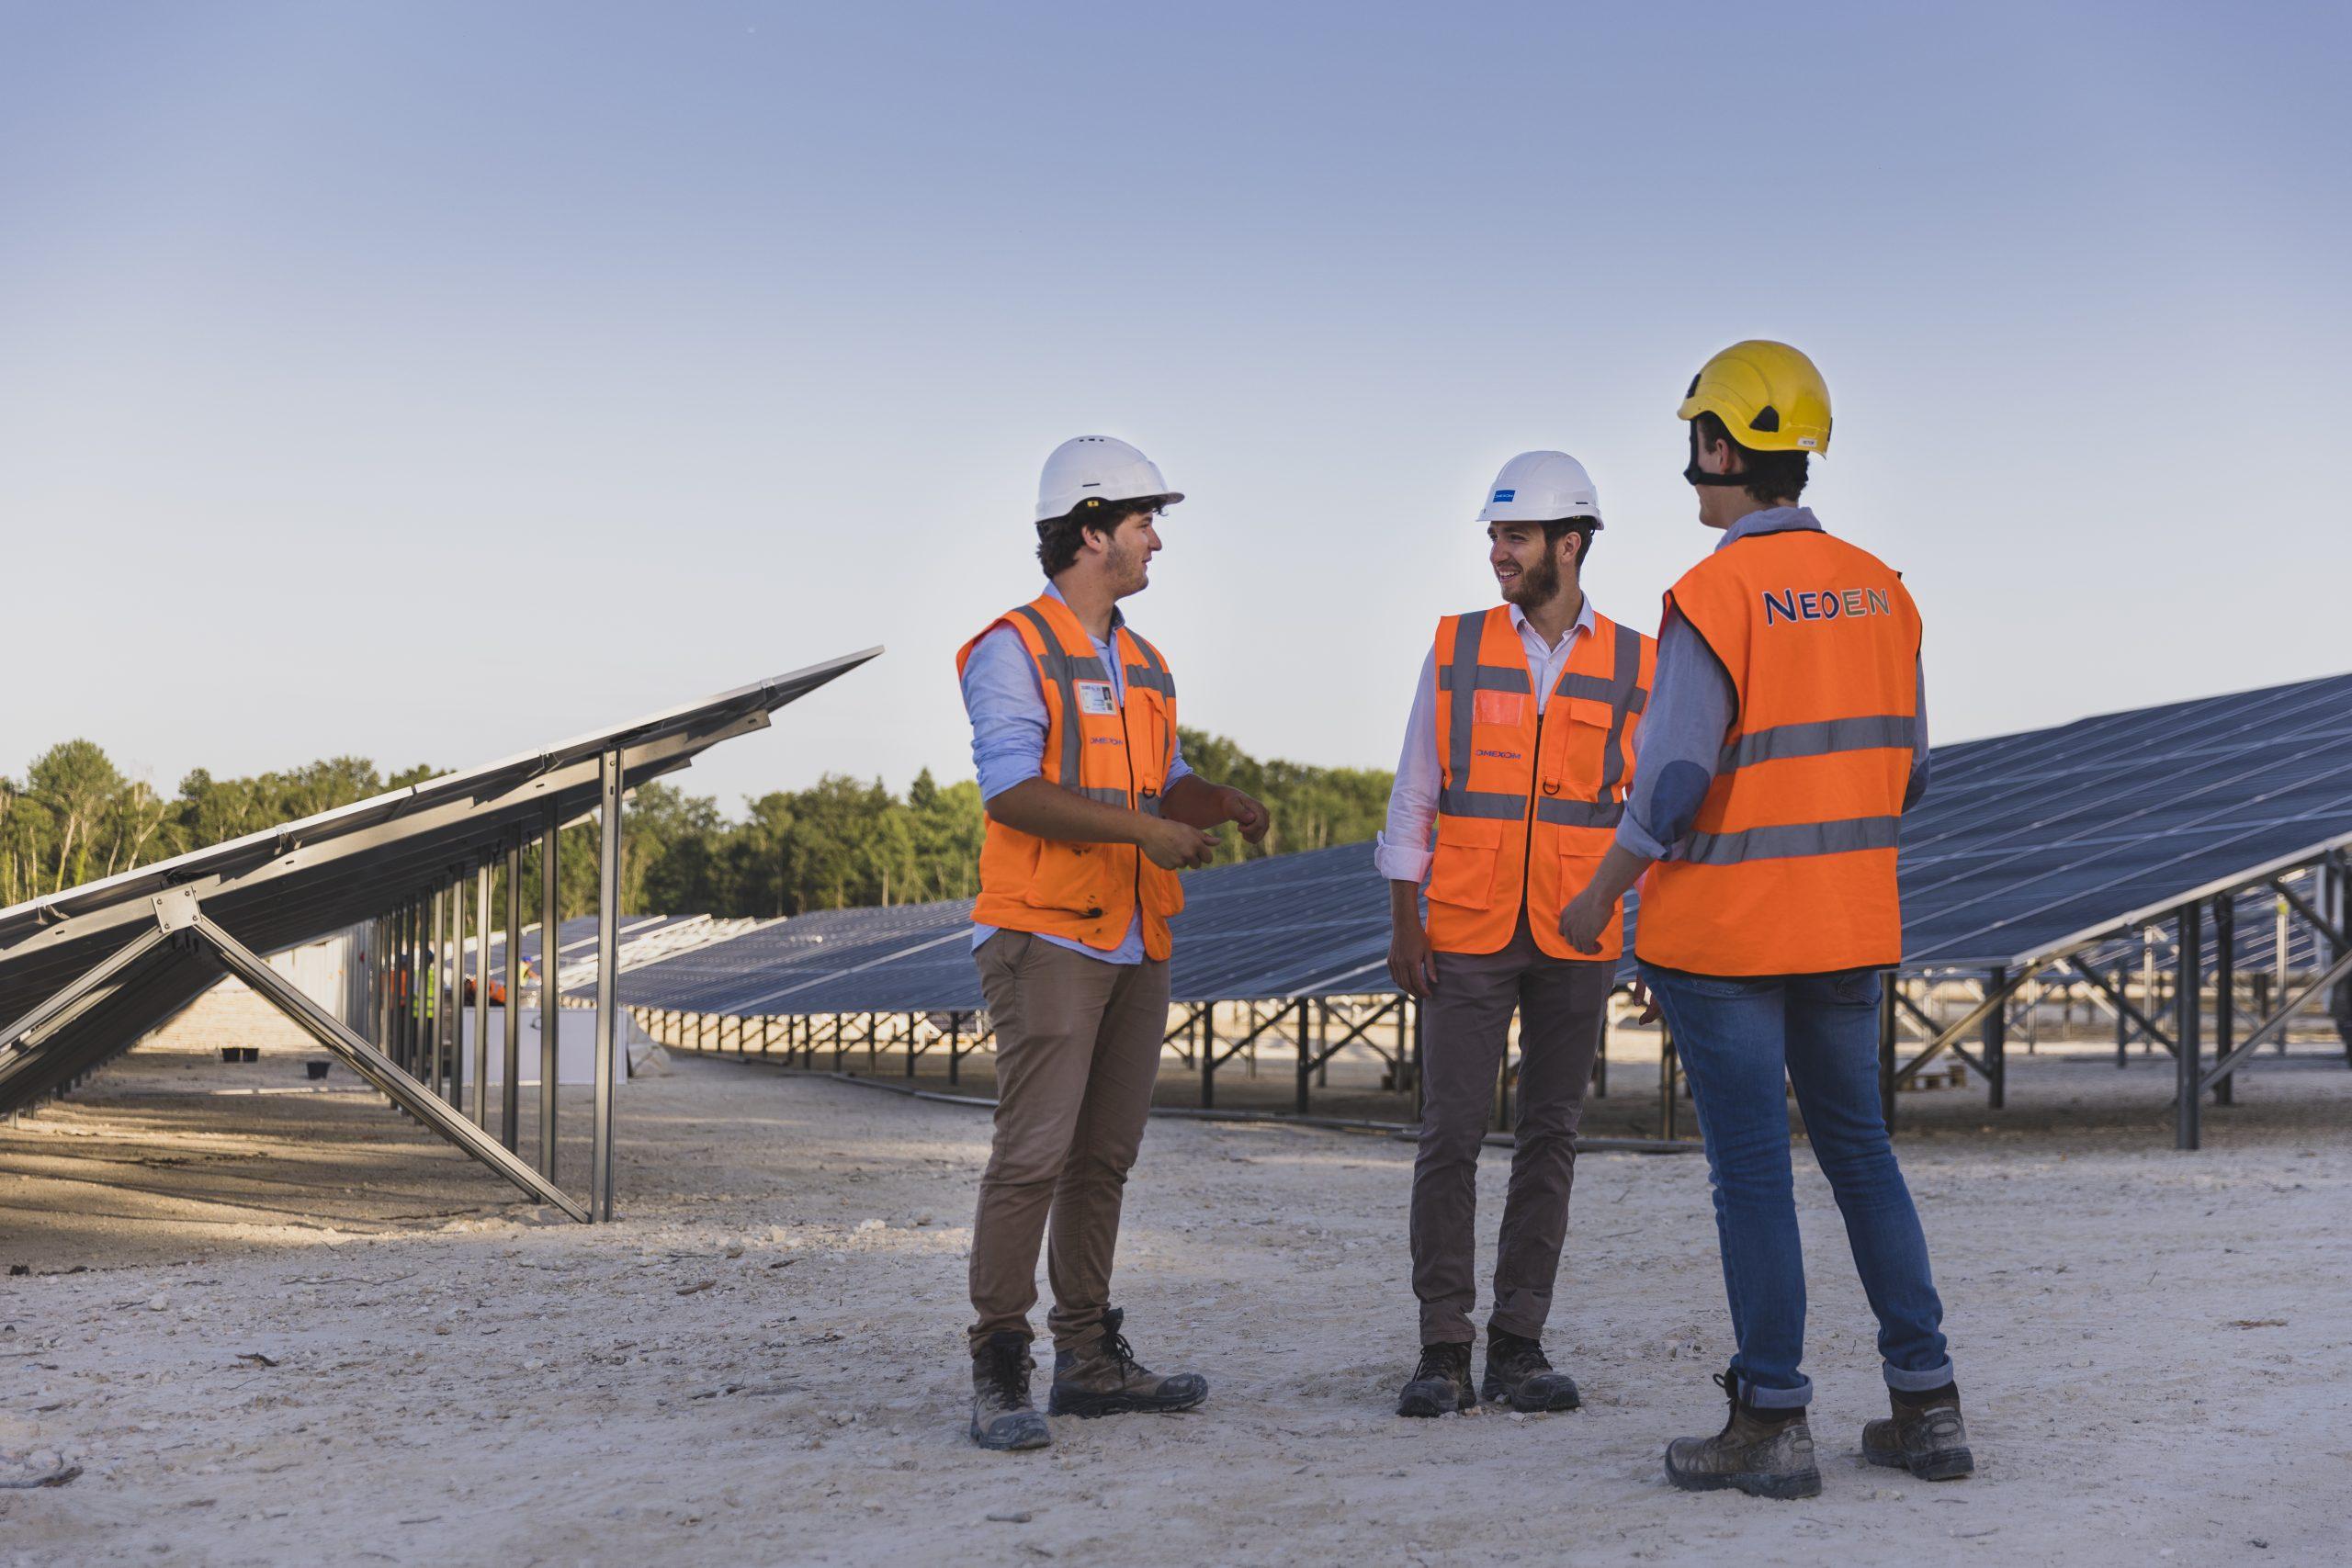 Paulmy-solar-power-plant-quarry-clay